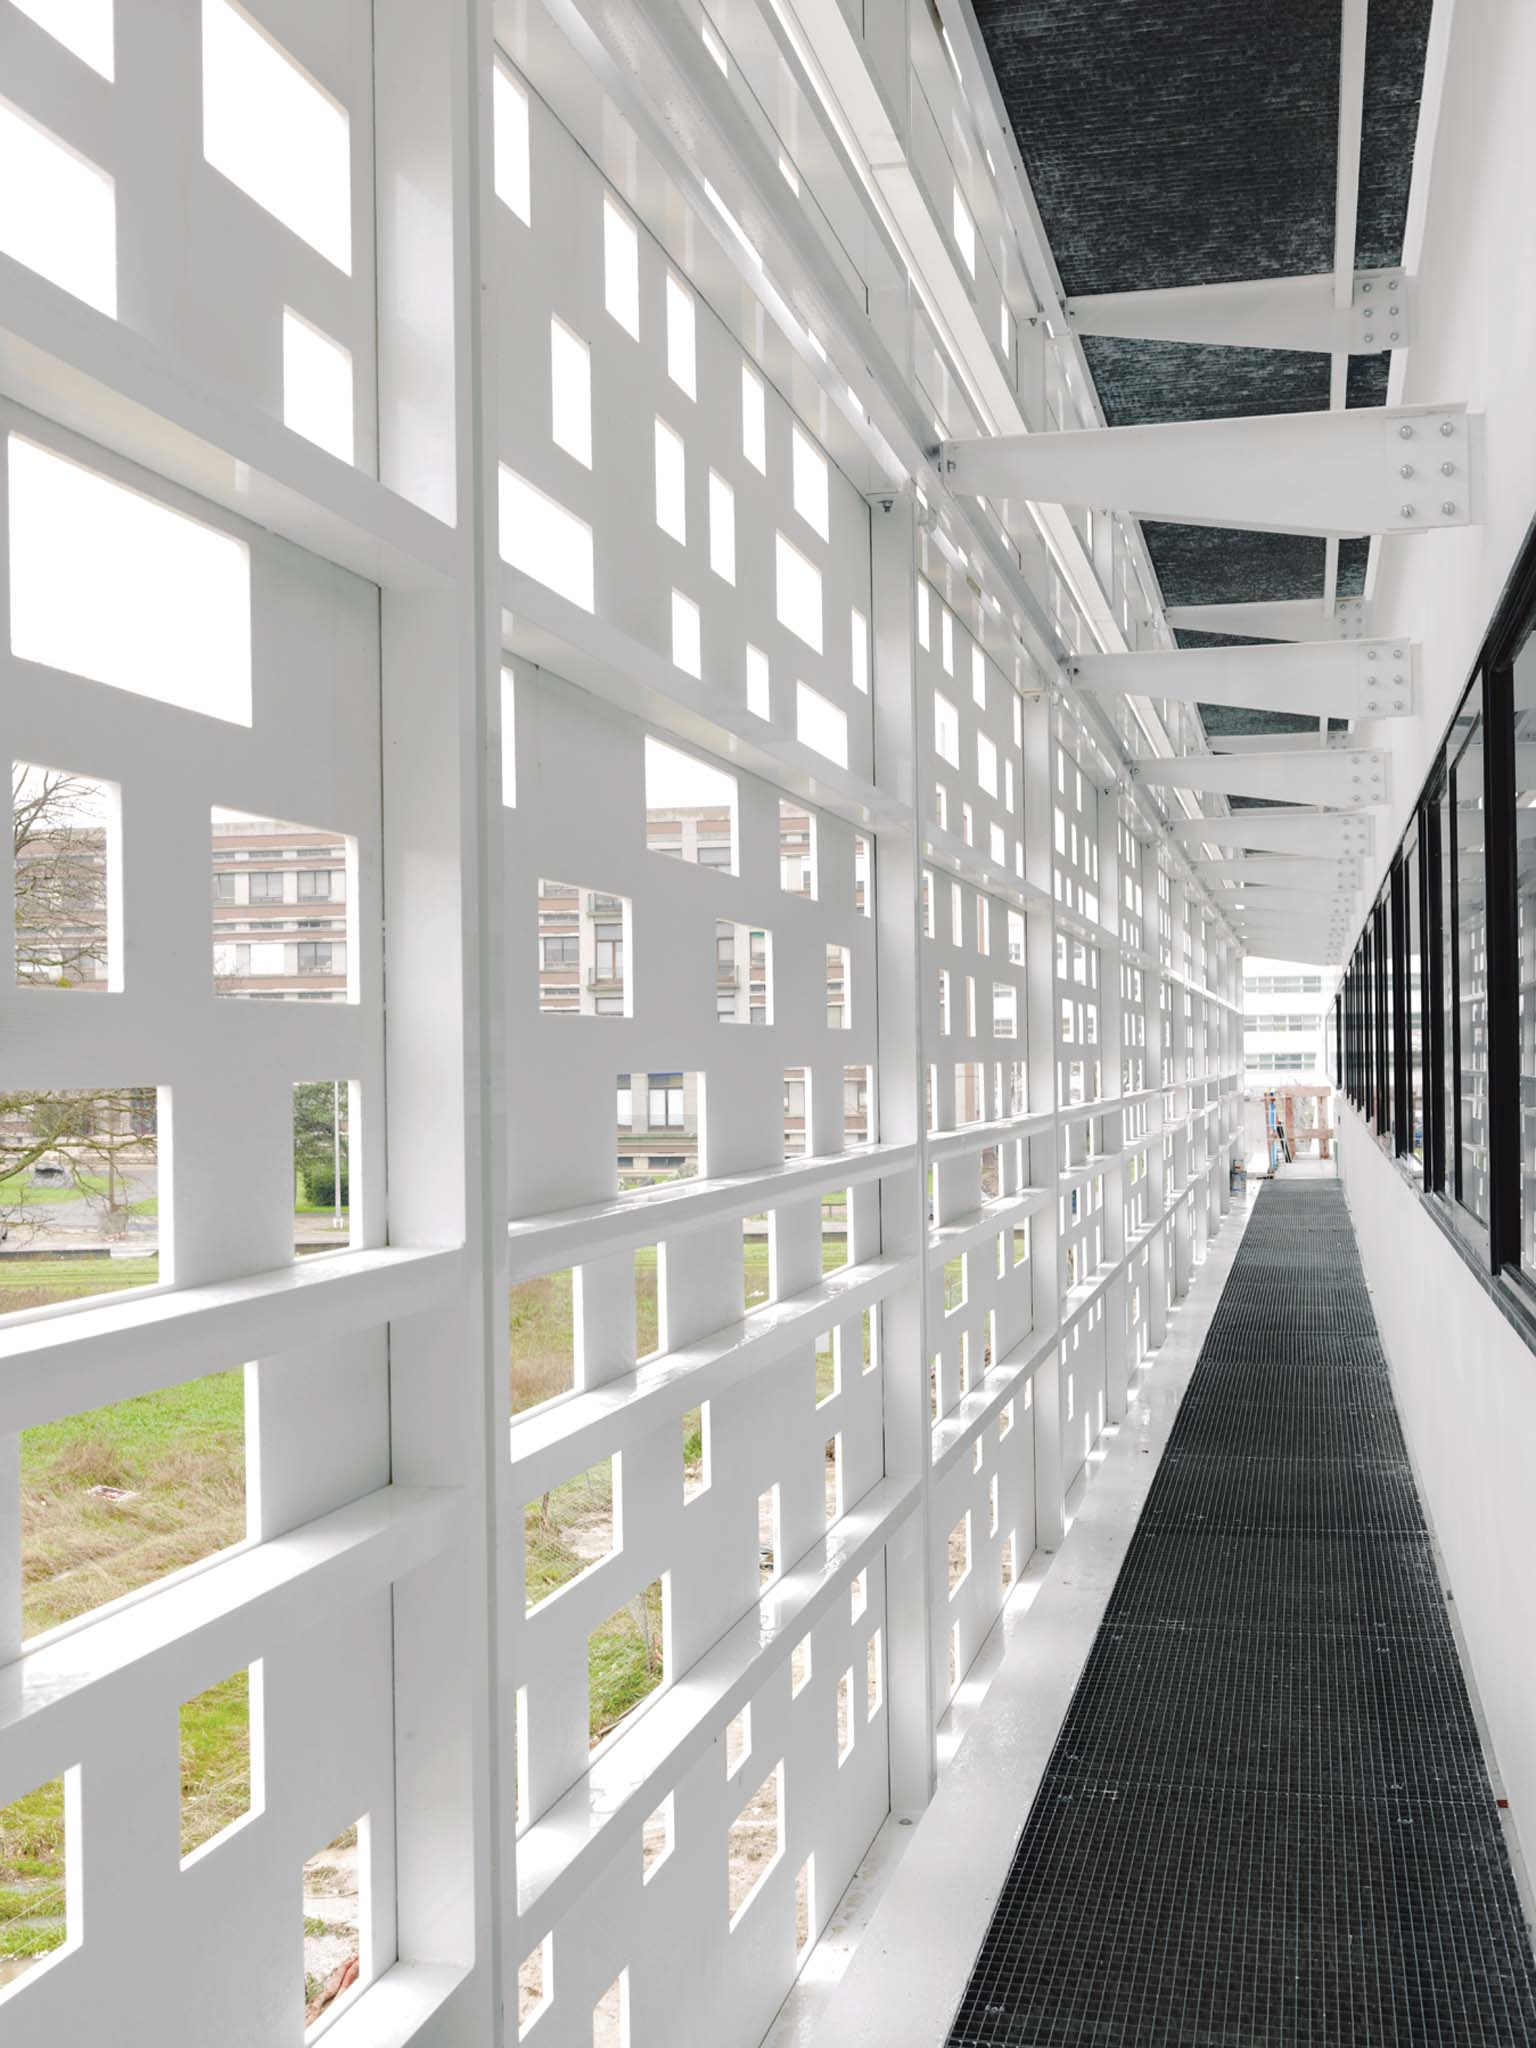 protections solaires krion lux 1100 porcelanosa. Black Bedroom Furniture Sets. Home Design Ideas